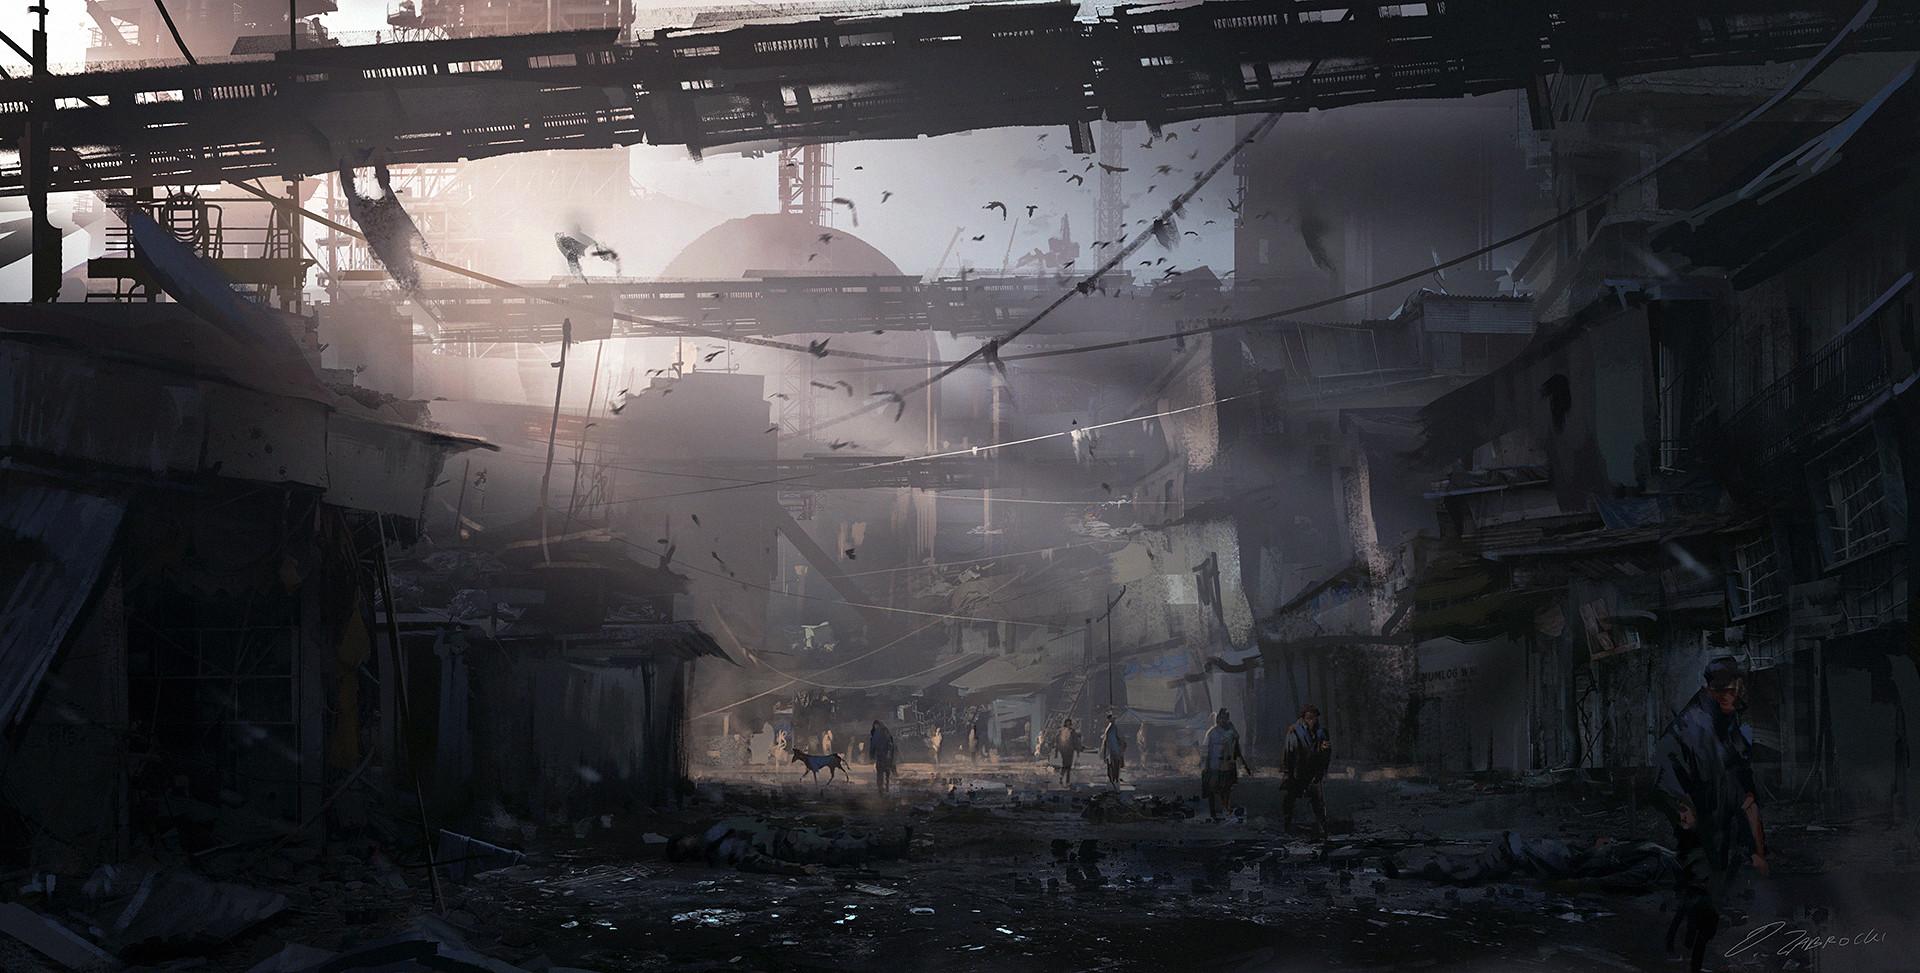 darek-zabrocki-slums-final-darekzabrocki.jpg